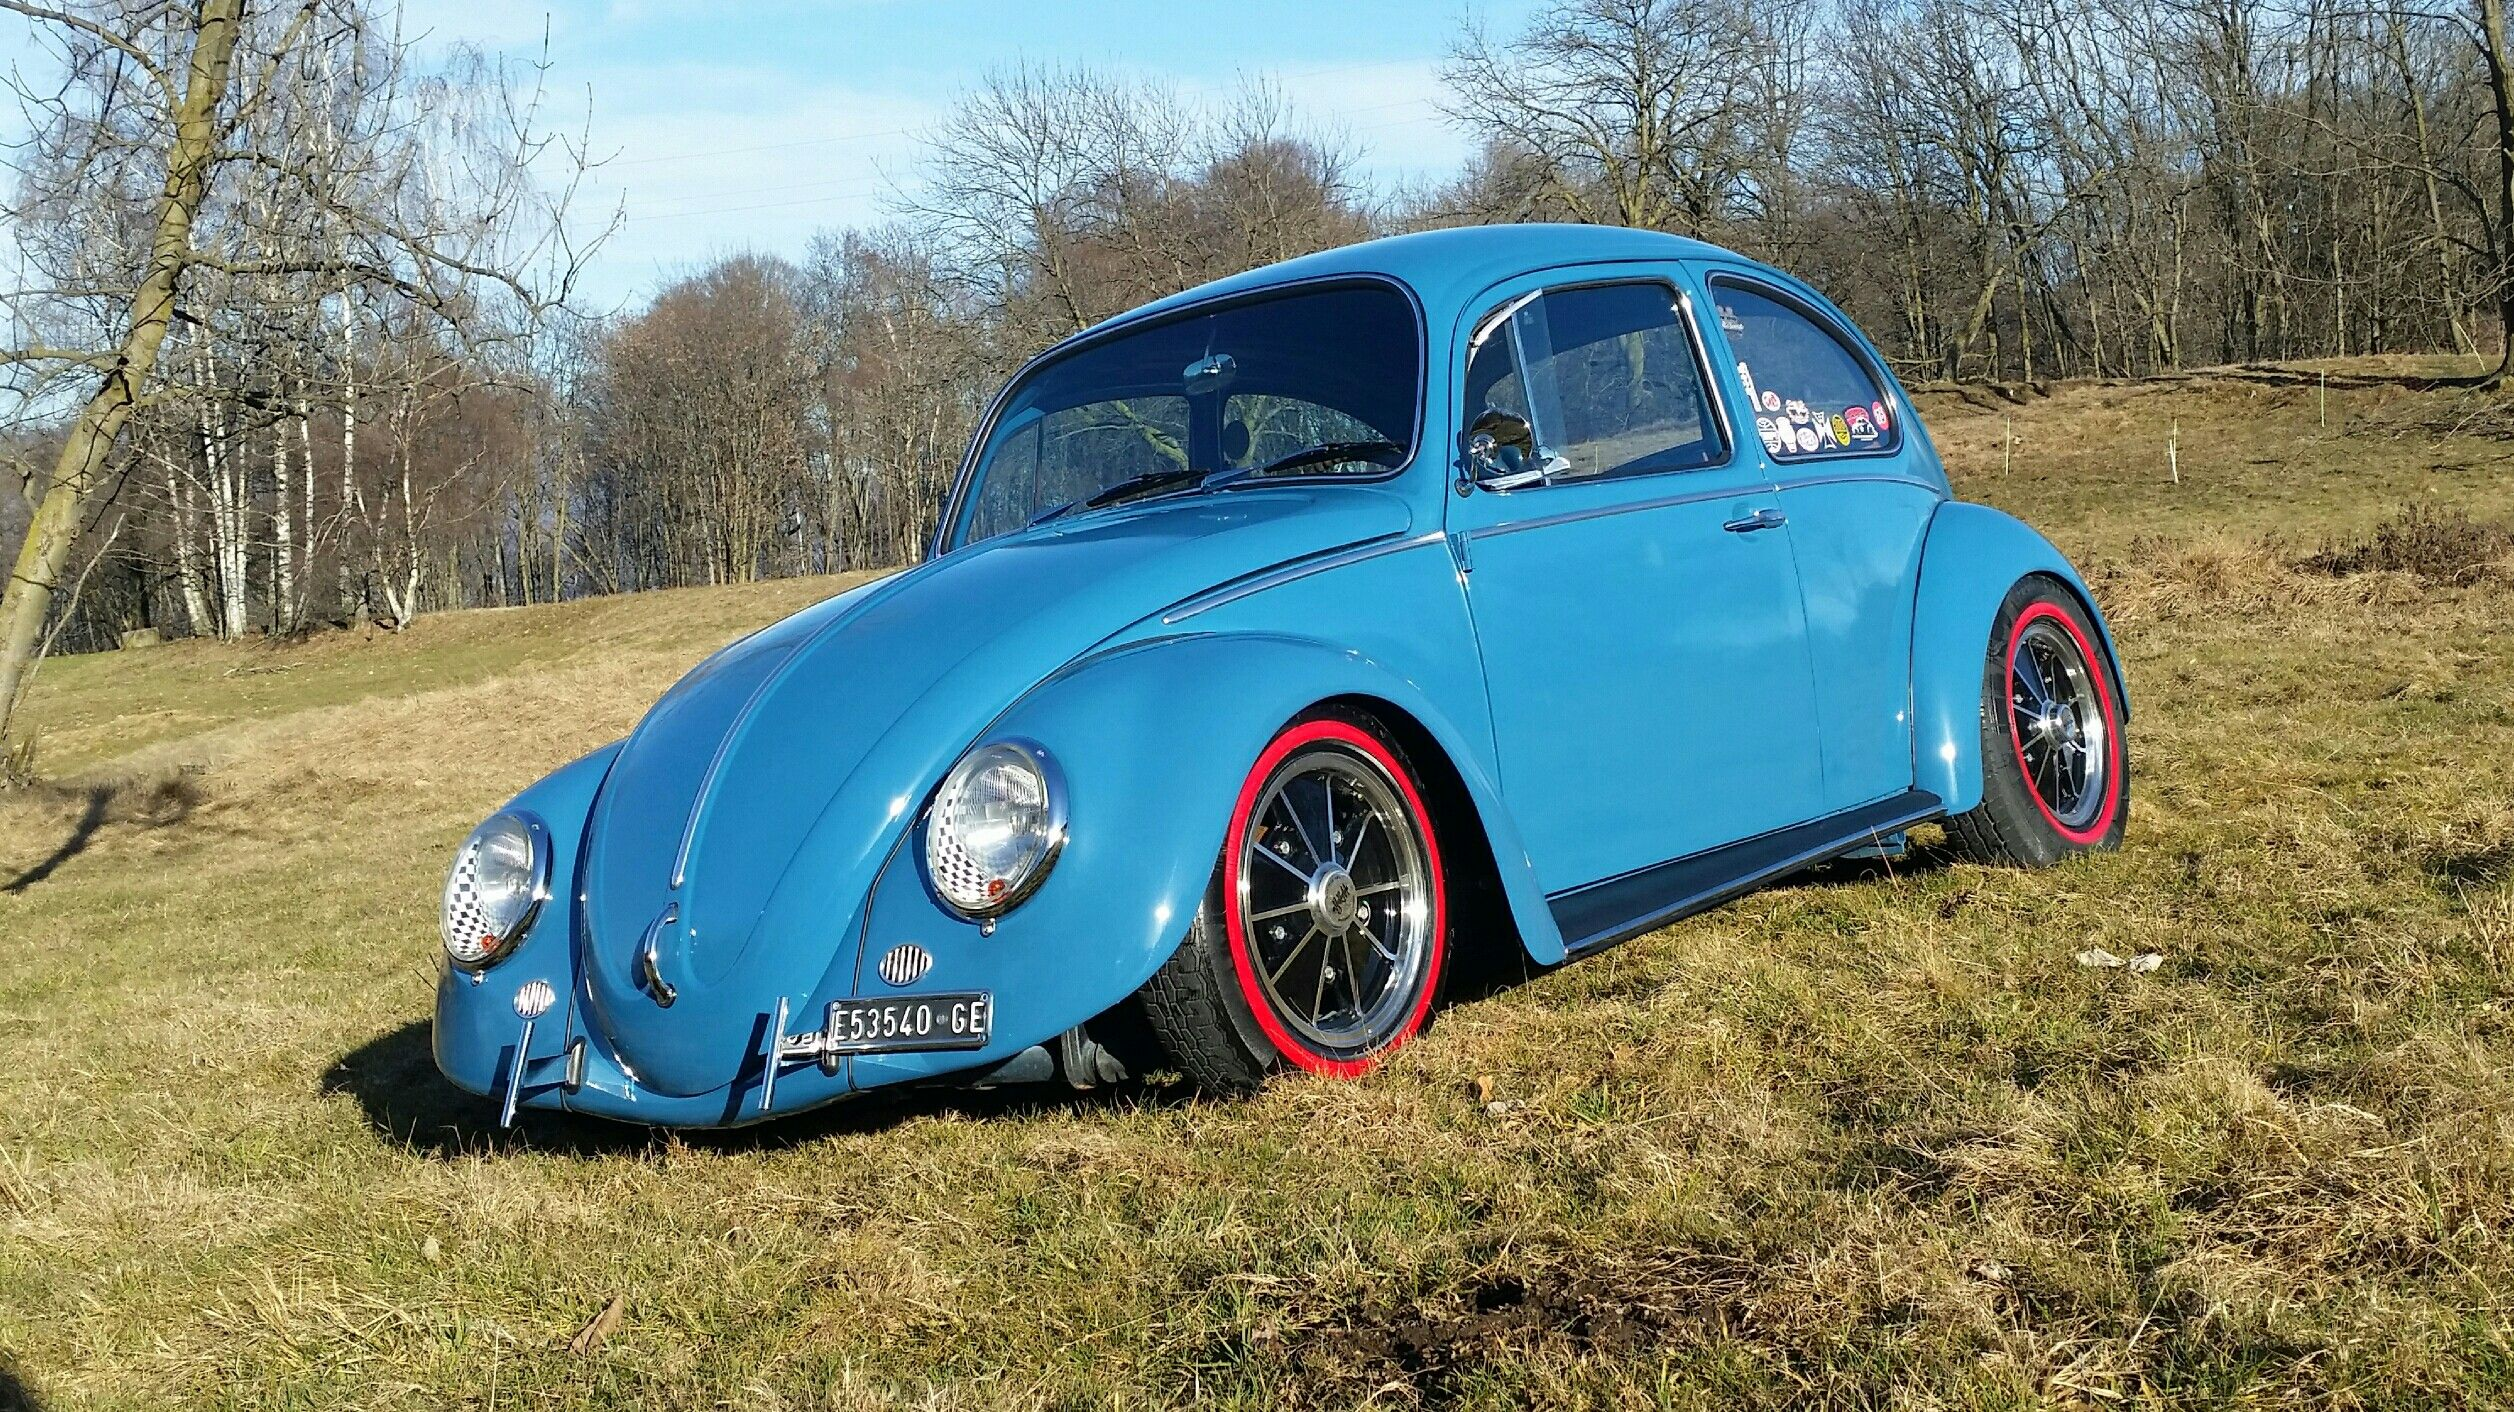 medium resolution of vw beetle bug coccinelle maggiolino cal look vintage cool blue vintage racing